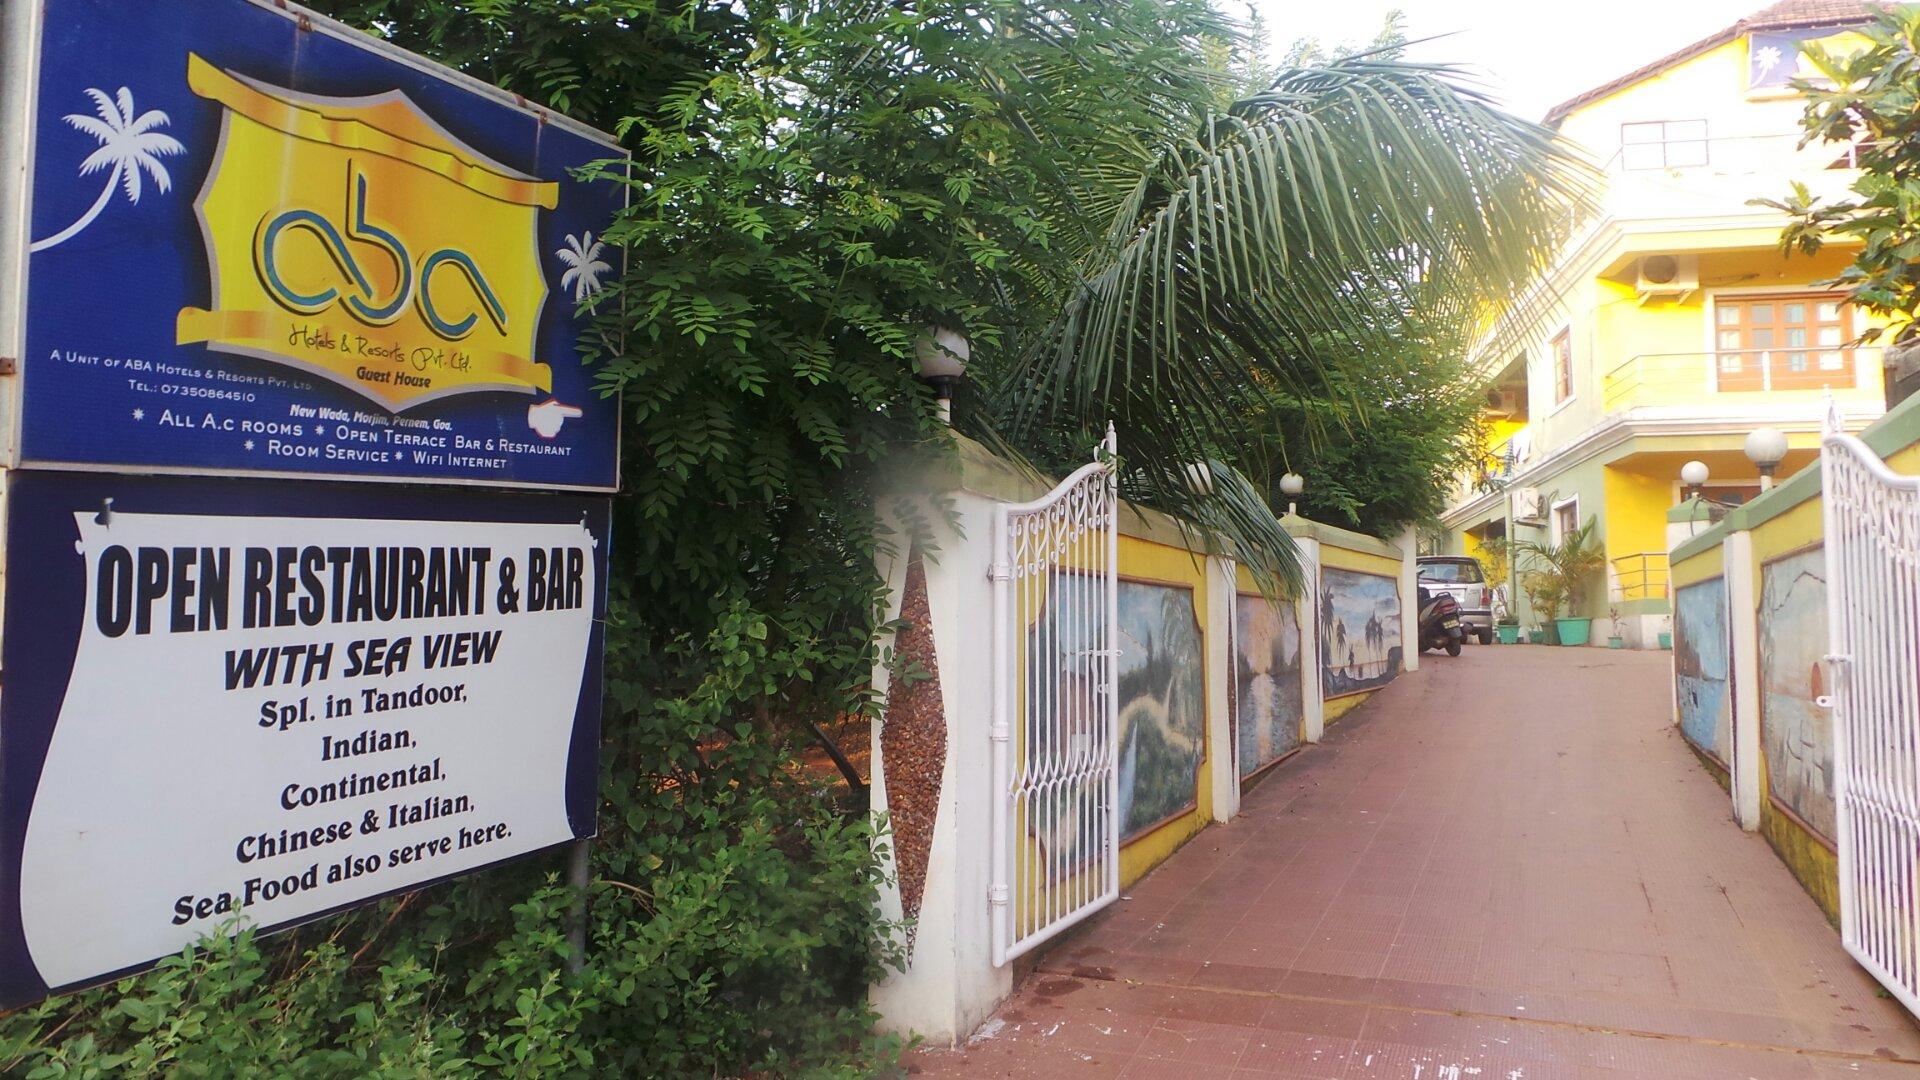 Aba Hotels and Resorts in Goa